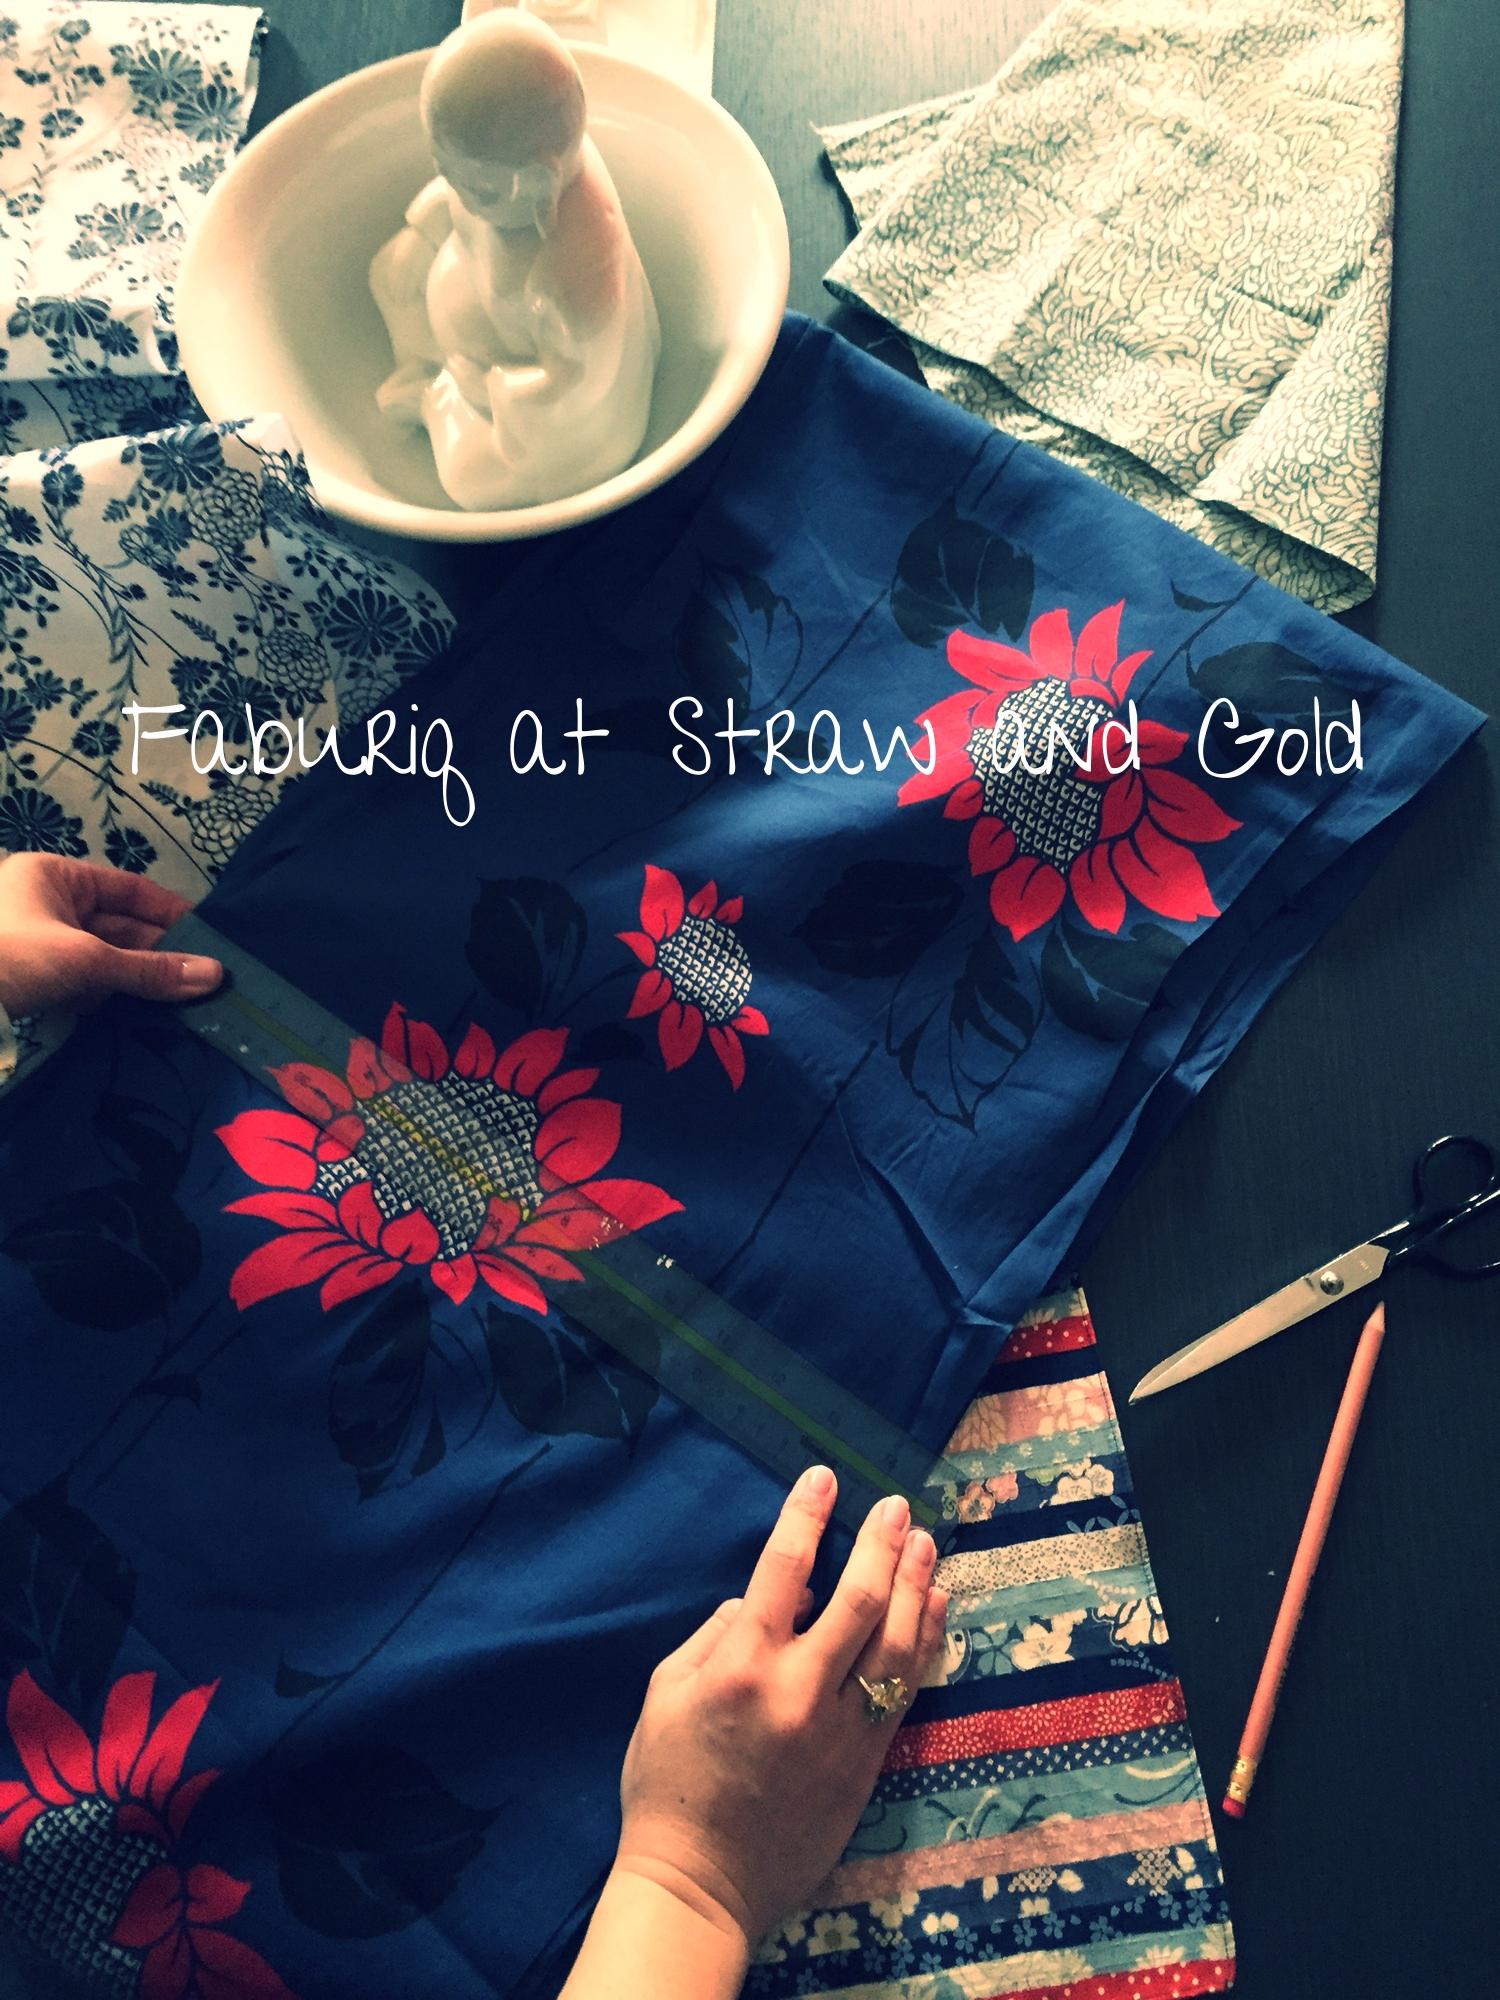 http://www.strawandgold.com/faburiq